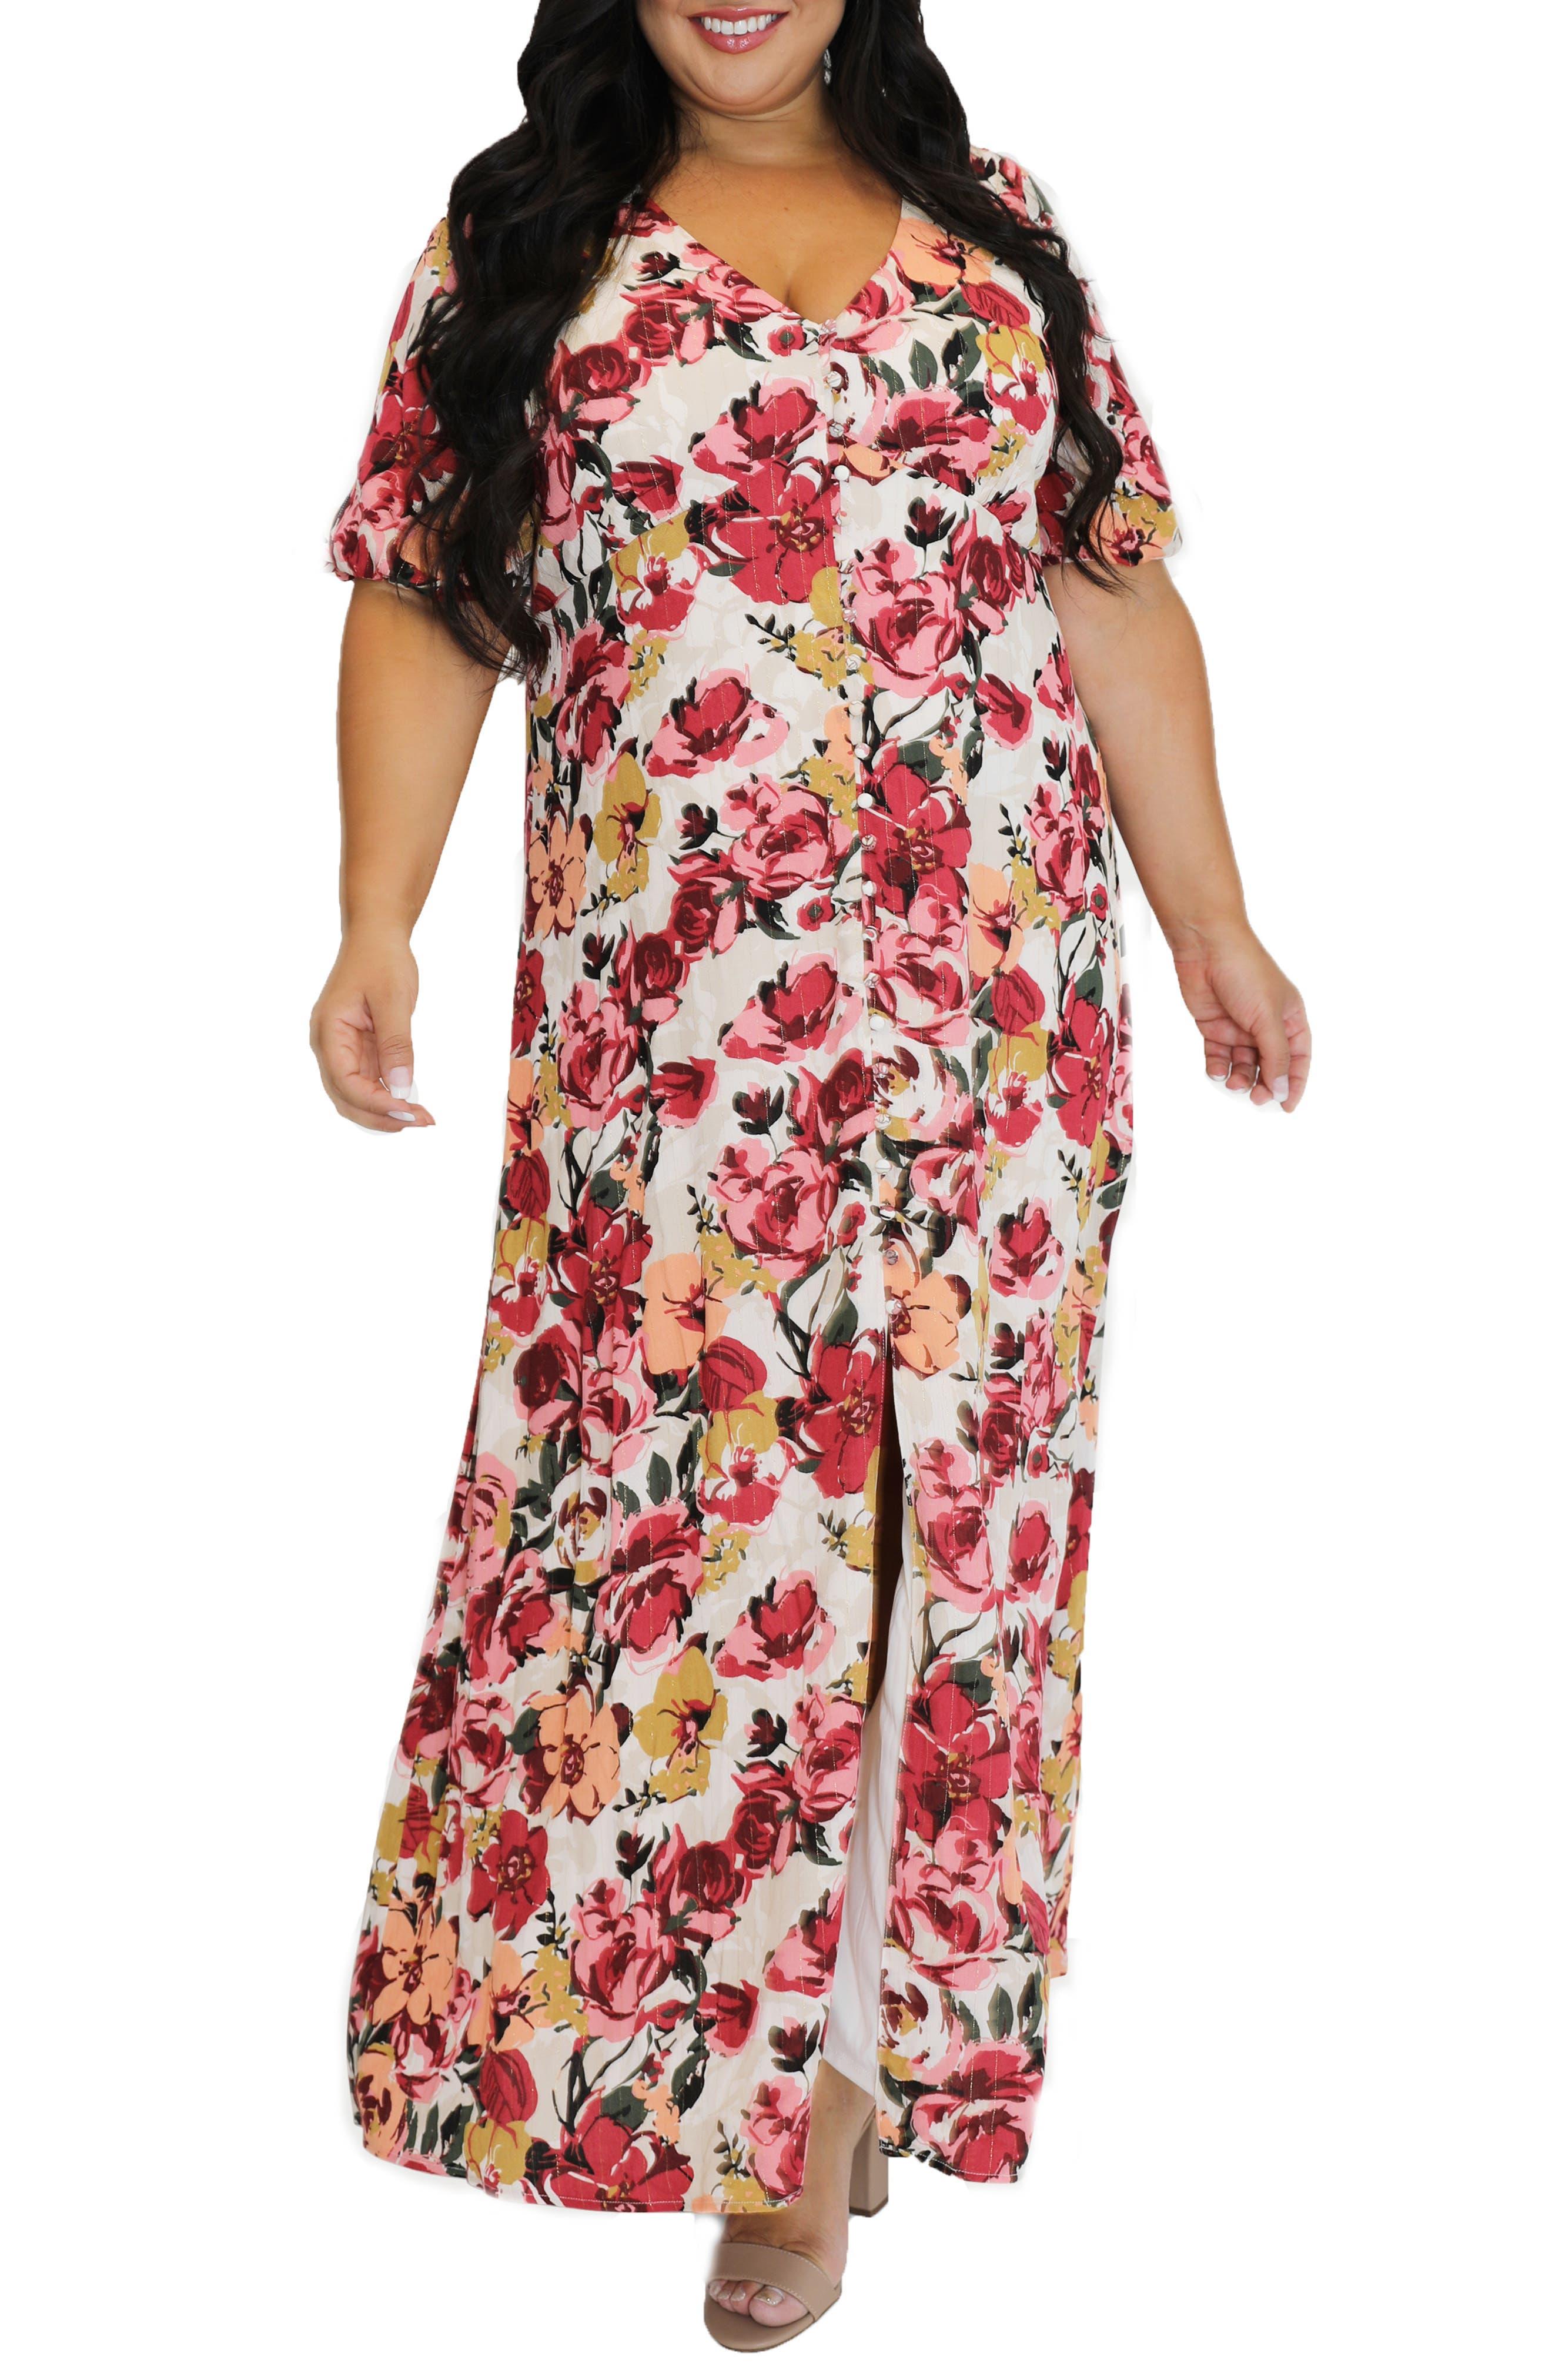 Floral Metallic Stripe Peasant Bodice Dress